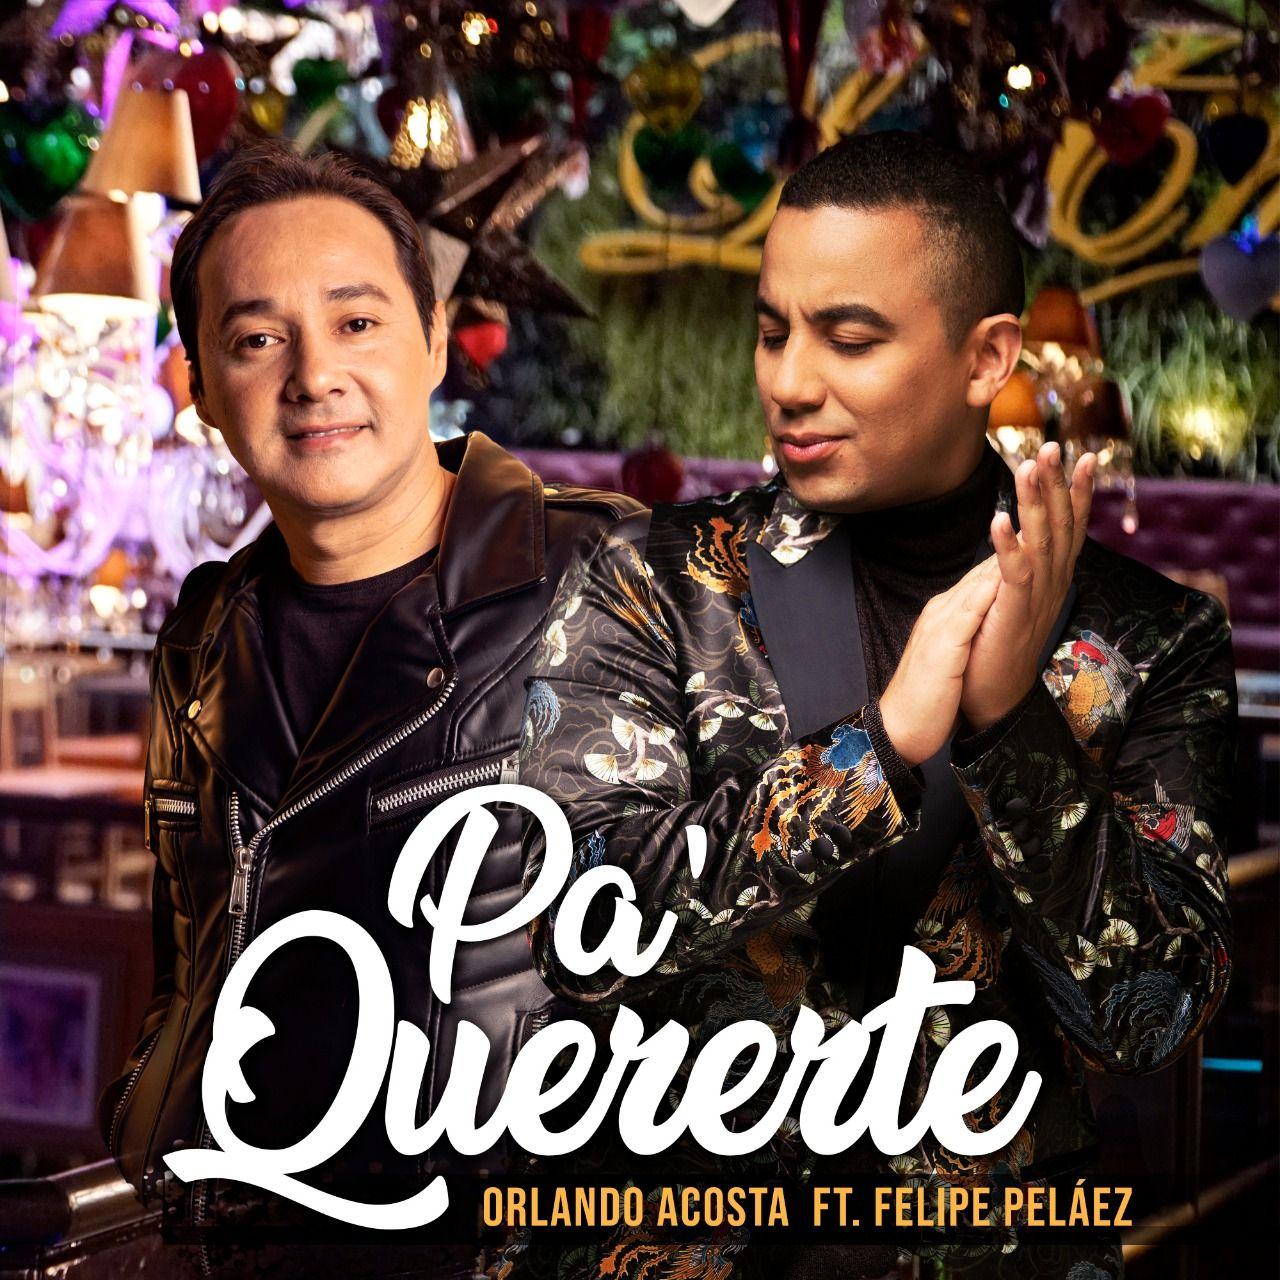 Pa Quererte Orlando Acosta ft Felipe Peláez